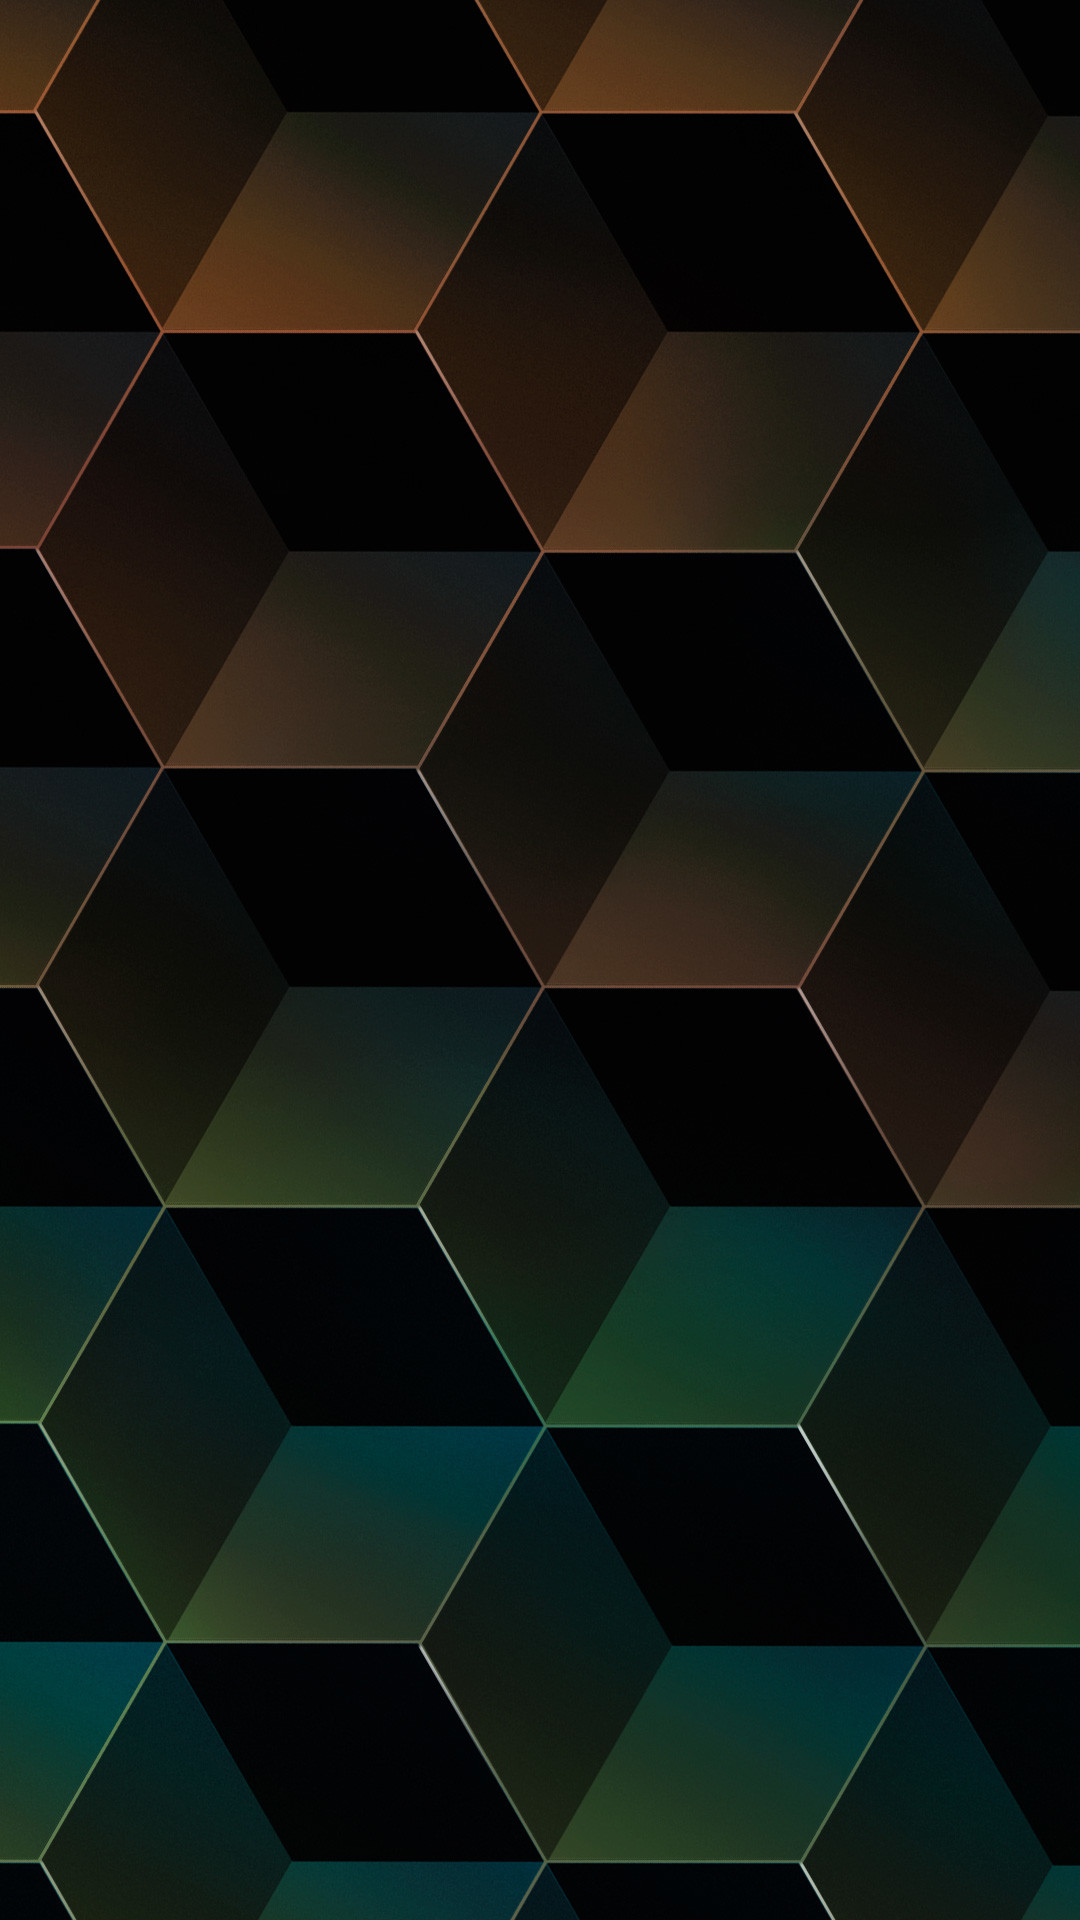 Geometric Gradient Facets Apple Iphone 7 Plus Hd Wallpapers